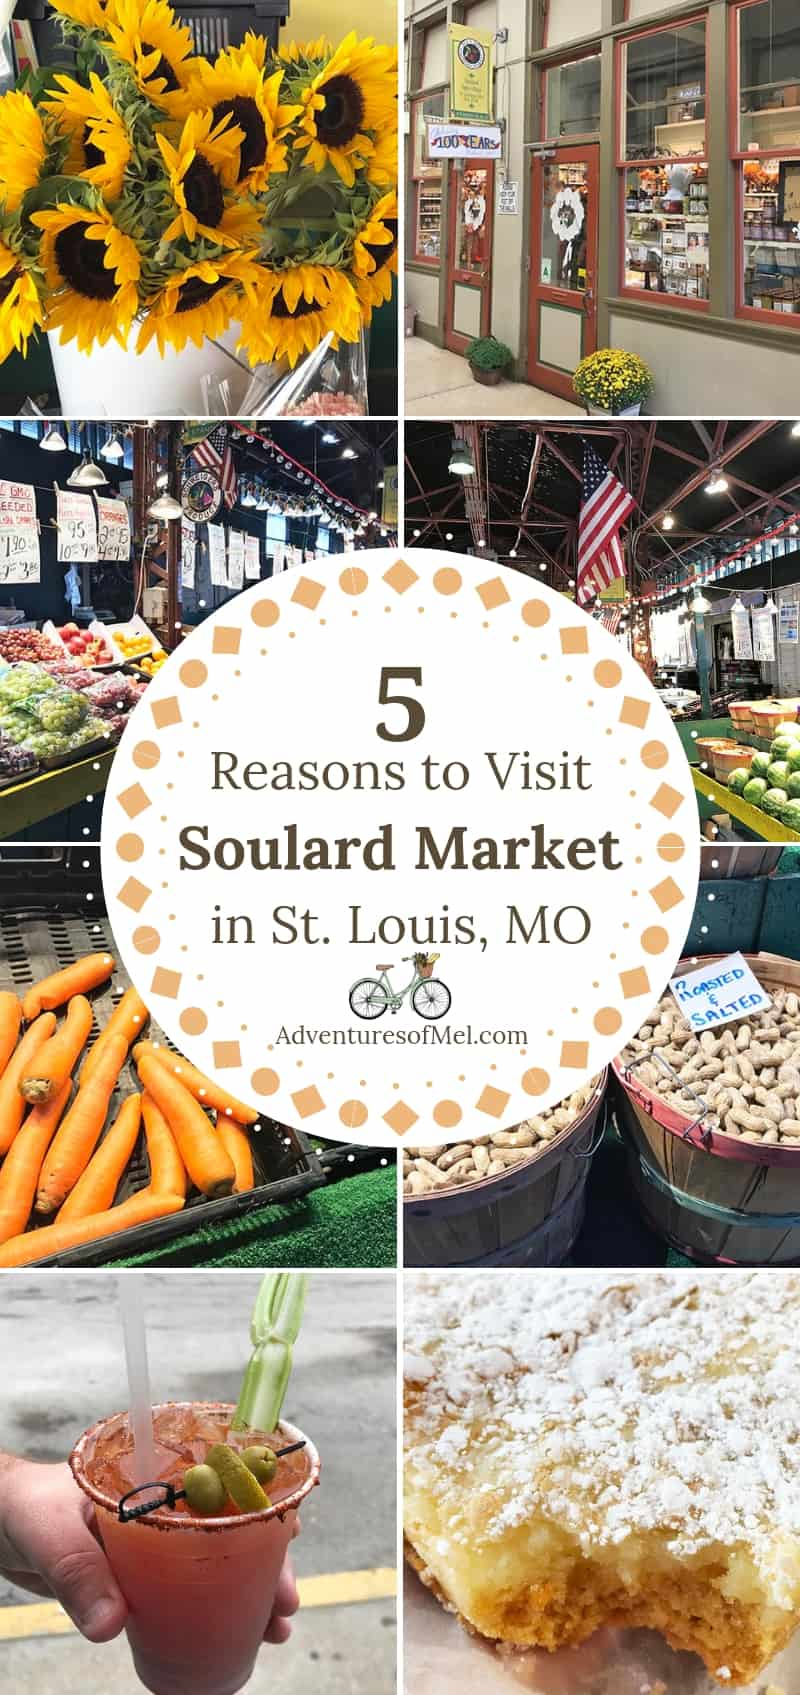 5 reasons to visit Soulard Market in St. Louis, Missouri